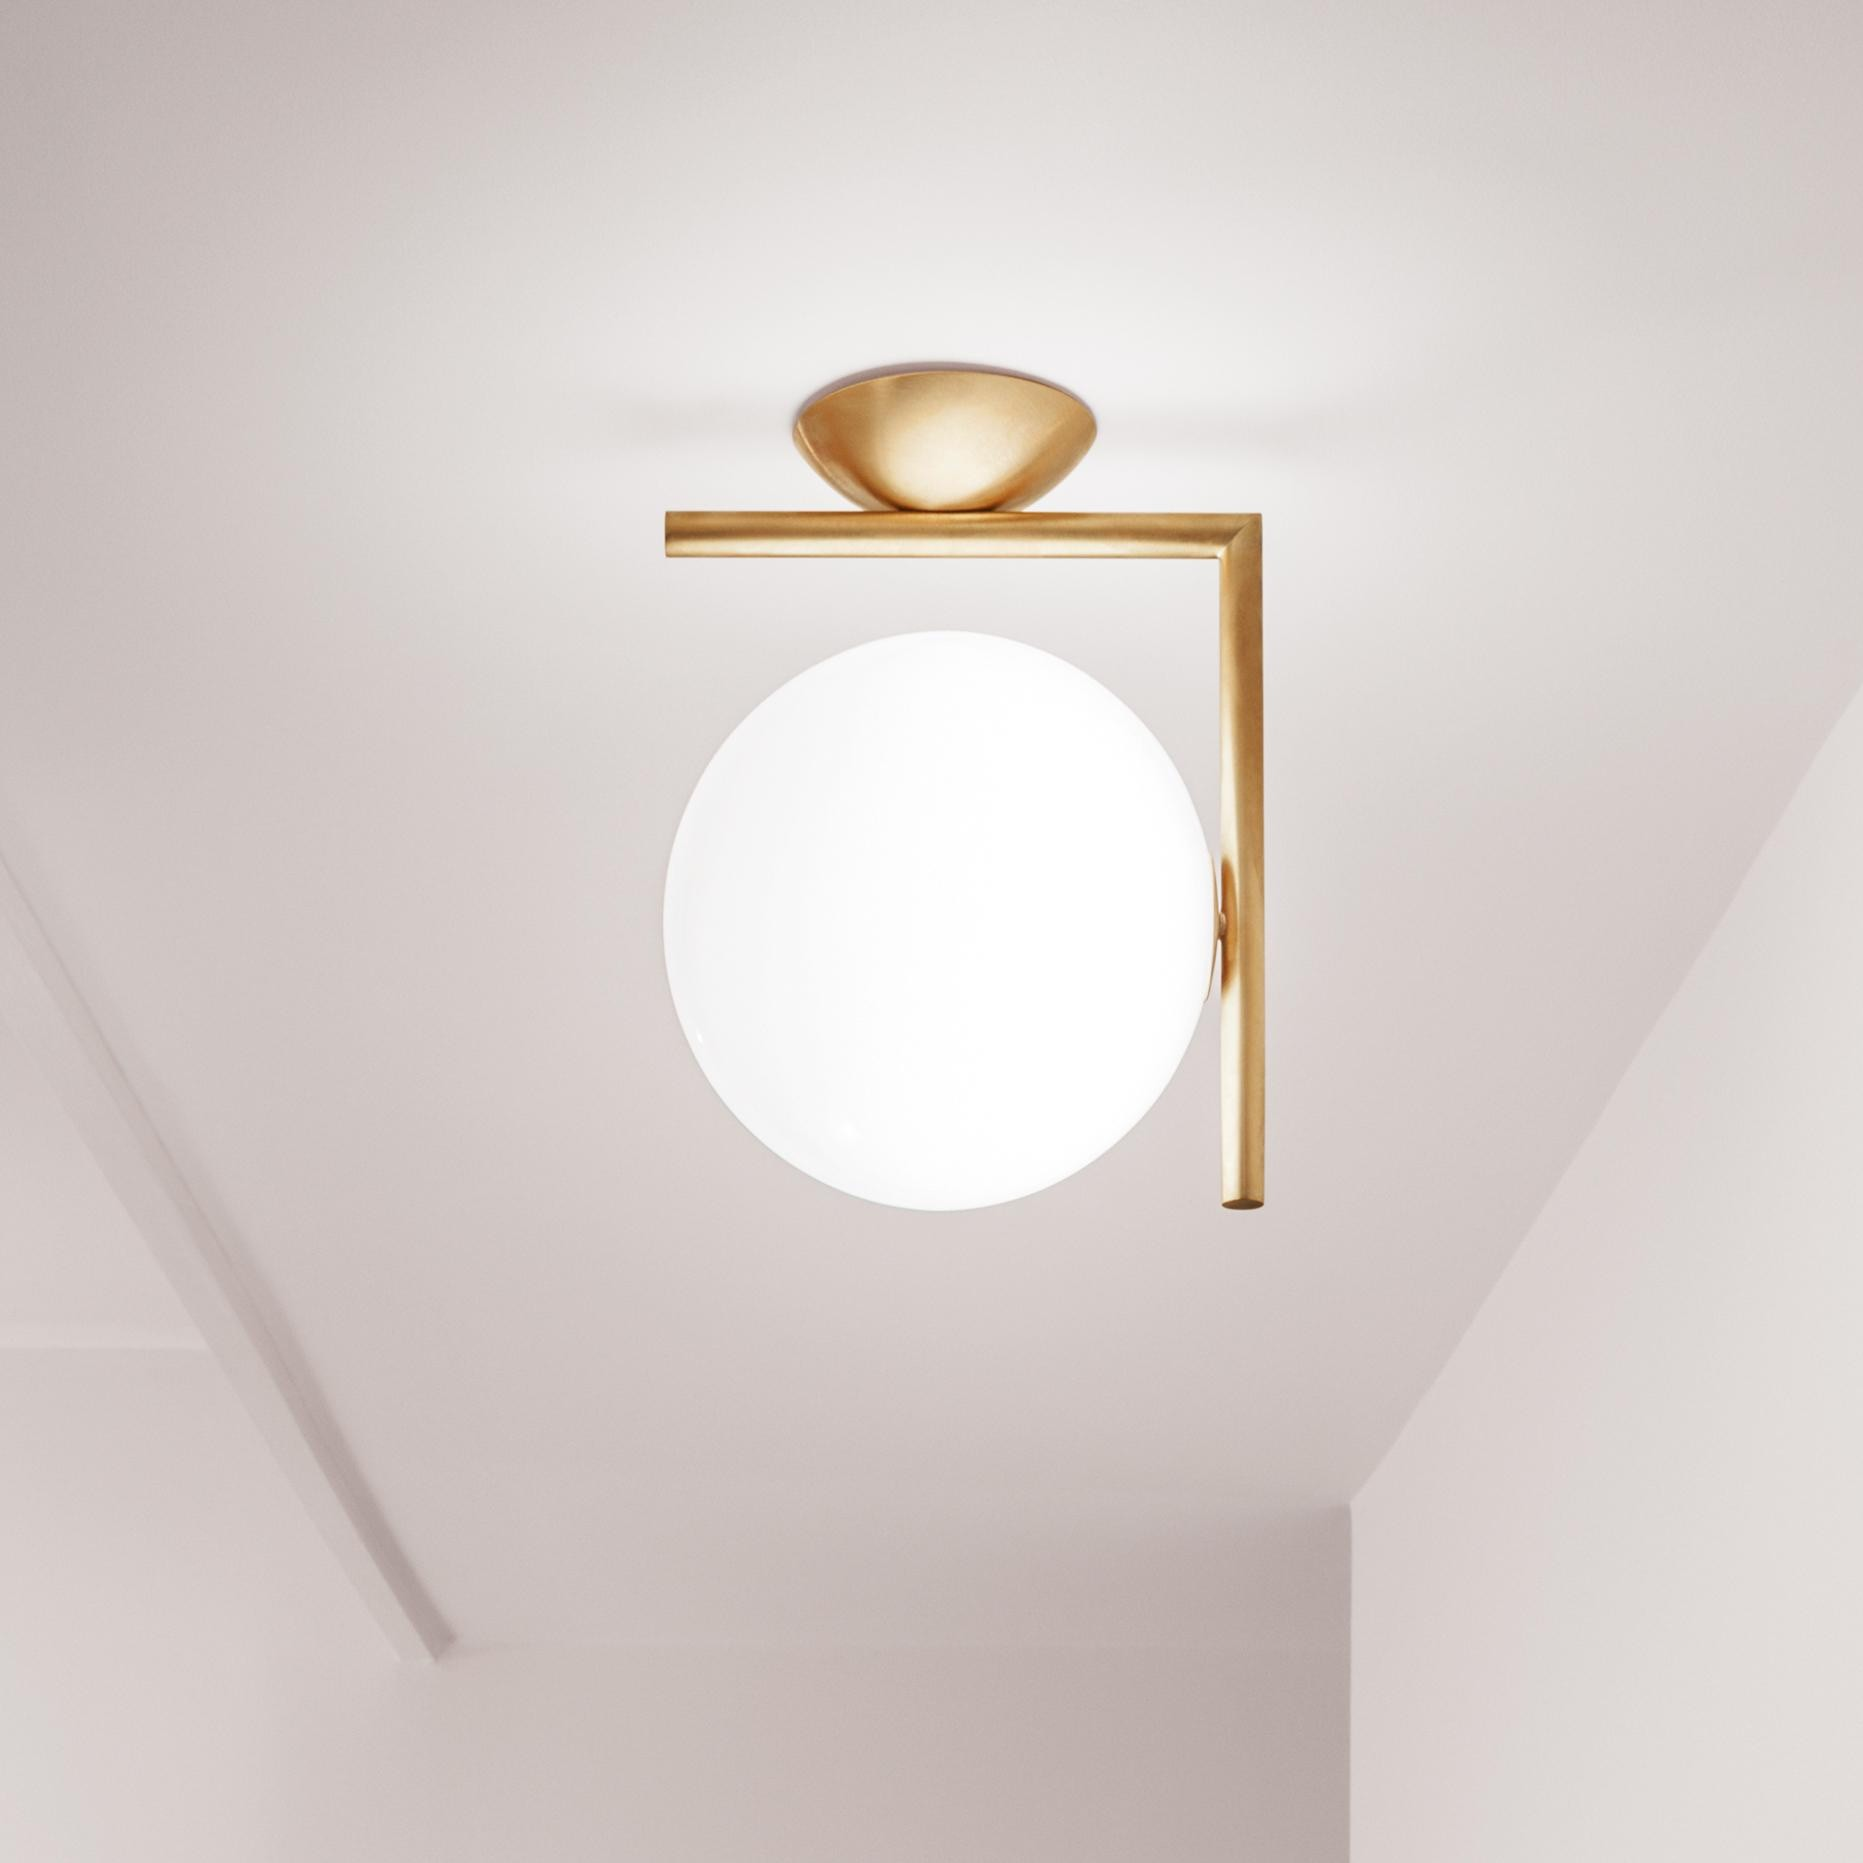 flos ic c w1 applique murale plafonnier ambientedirect. Black Bedroom Furniture Sets. Home Design Ideas